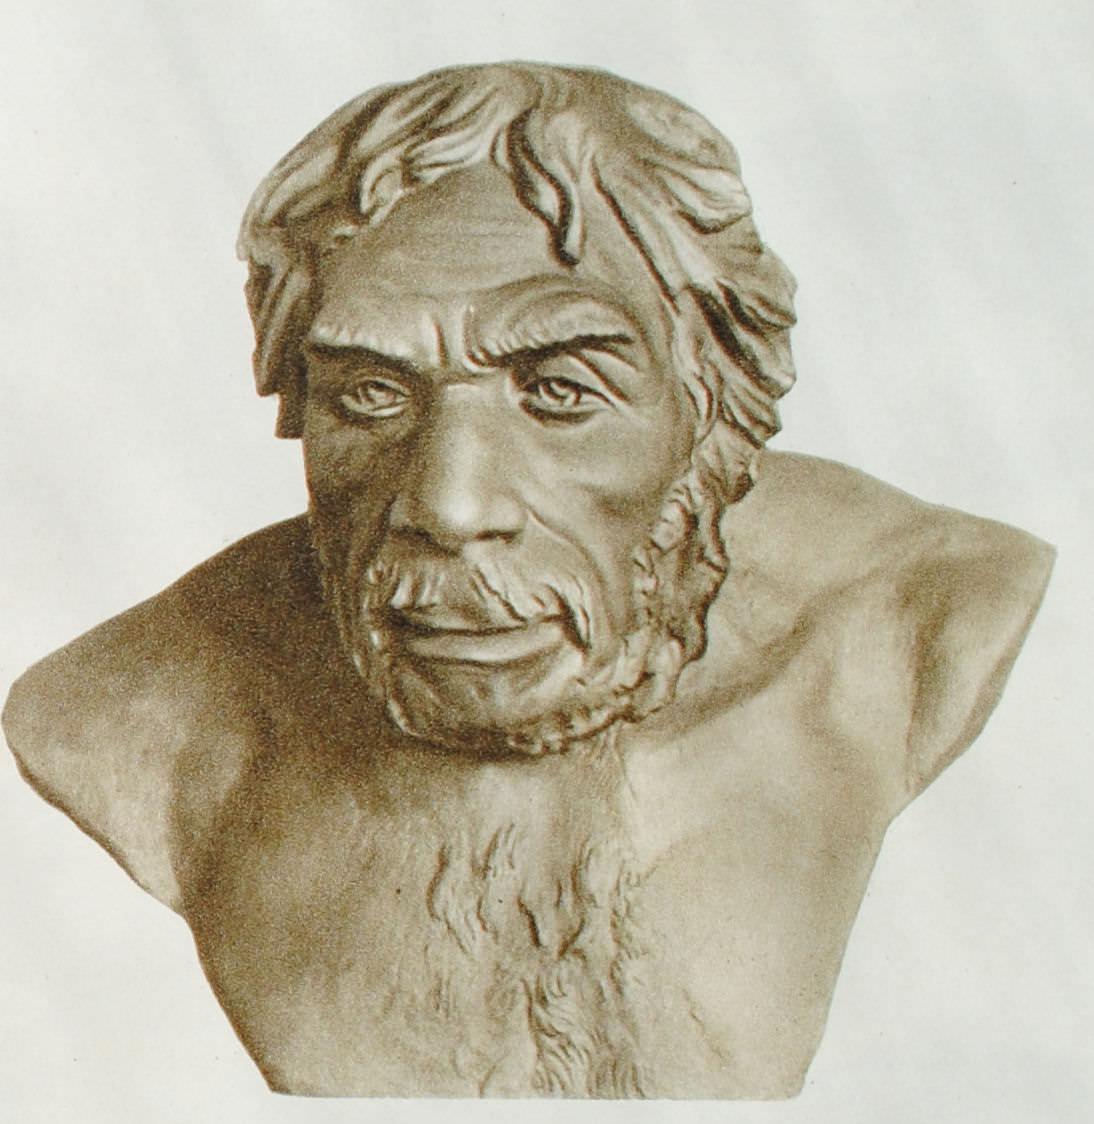 Неандерталец. Реконструкция М.М. Герасимова 1945 г. по черепу из Ля-Шапелля (Франция).